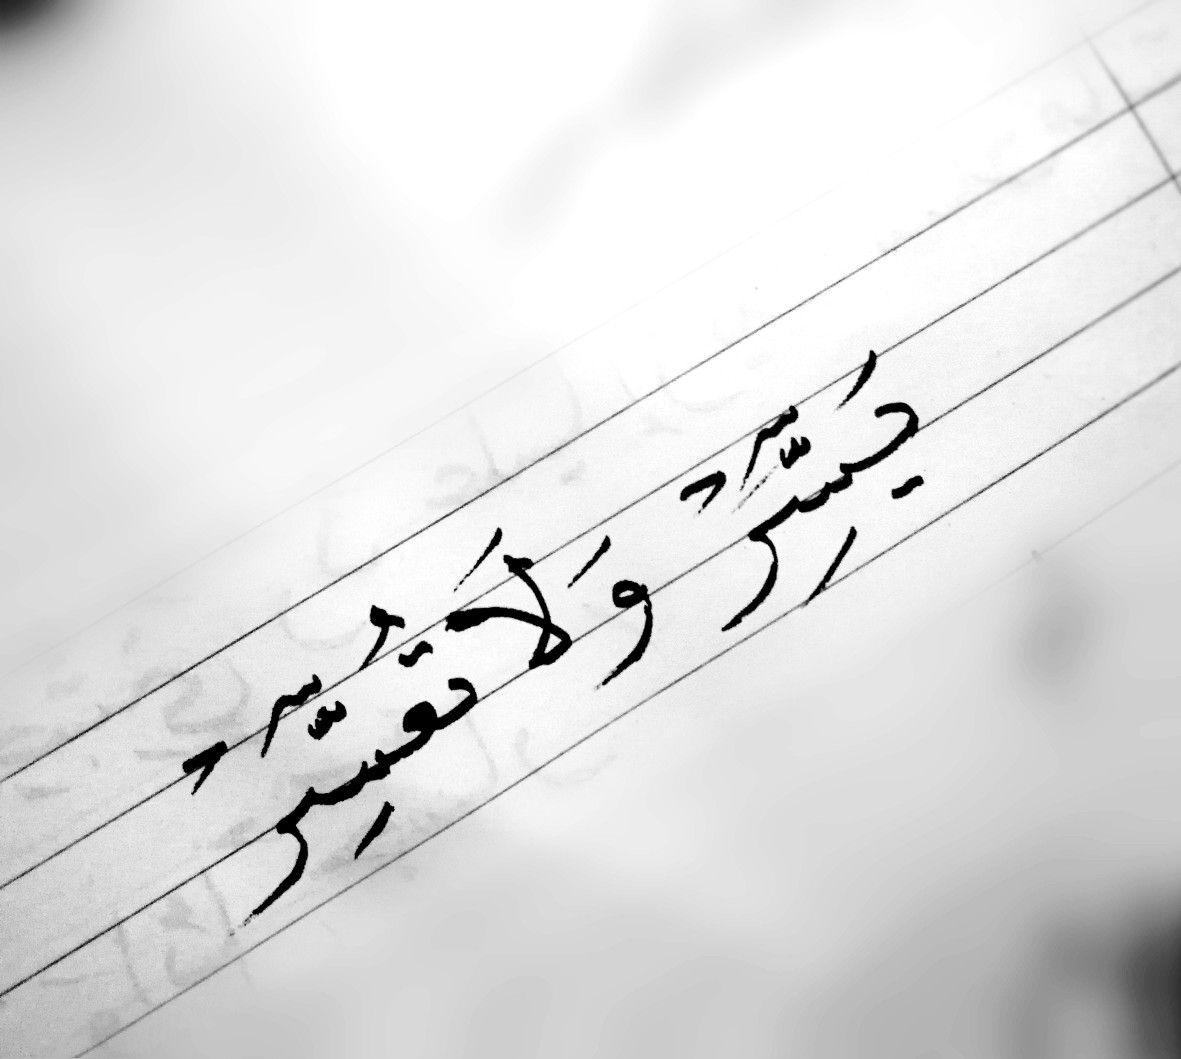 يارب يسر ولا تعسر Arabic Calligraphy Calligraphy Handwriting